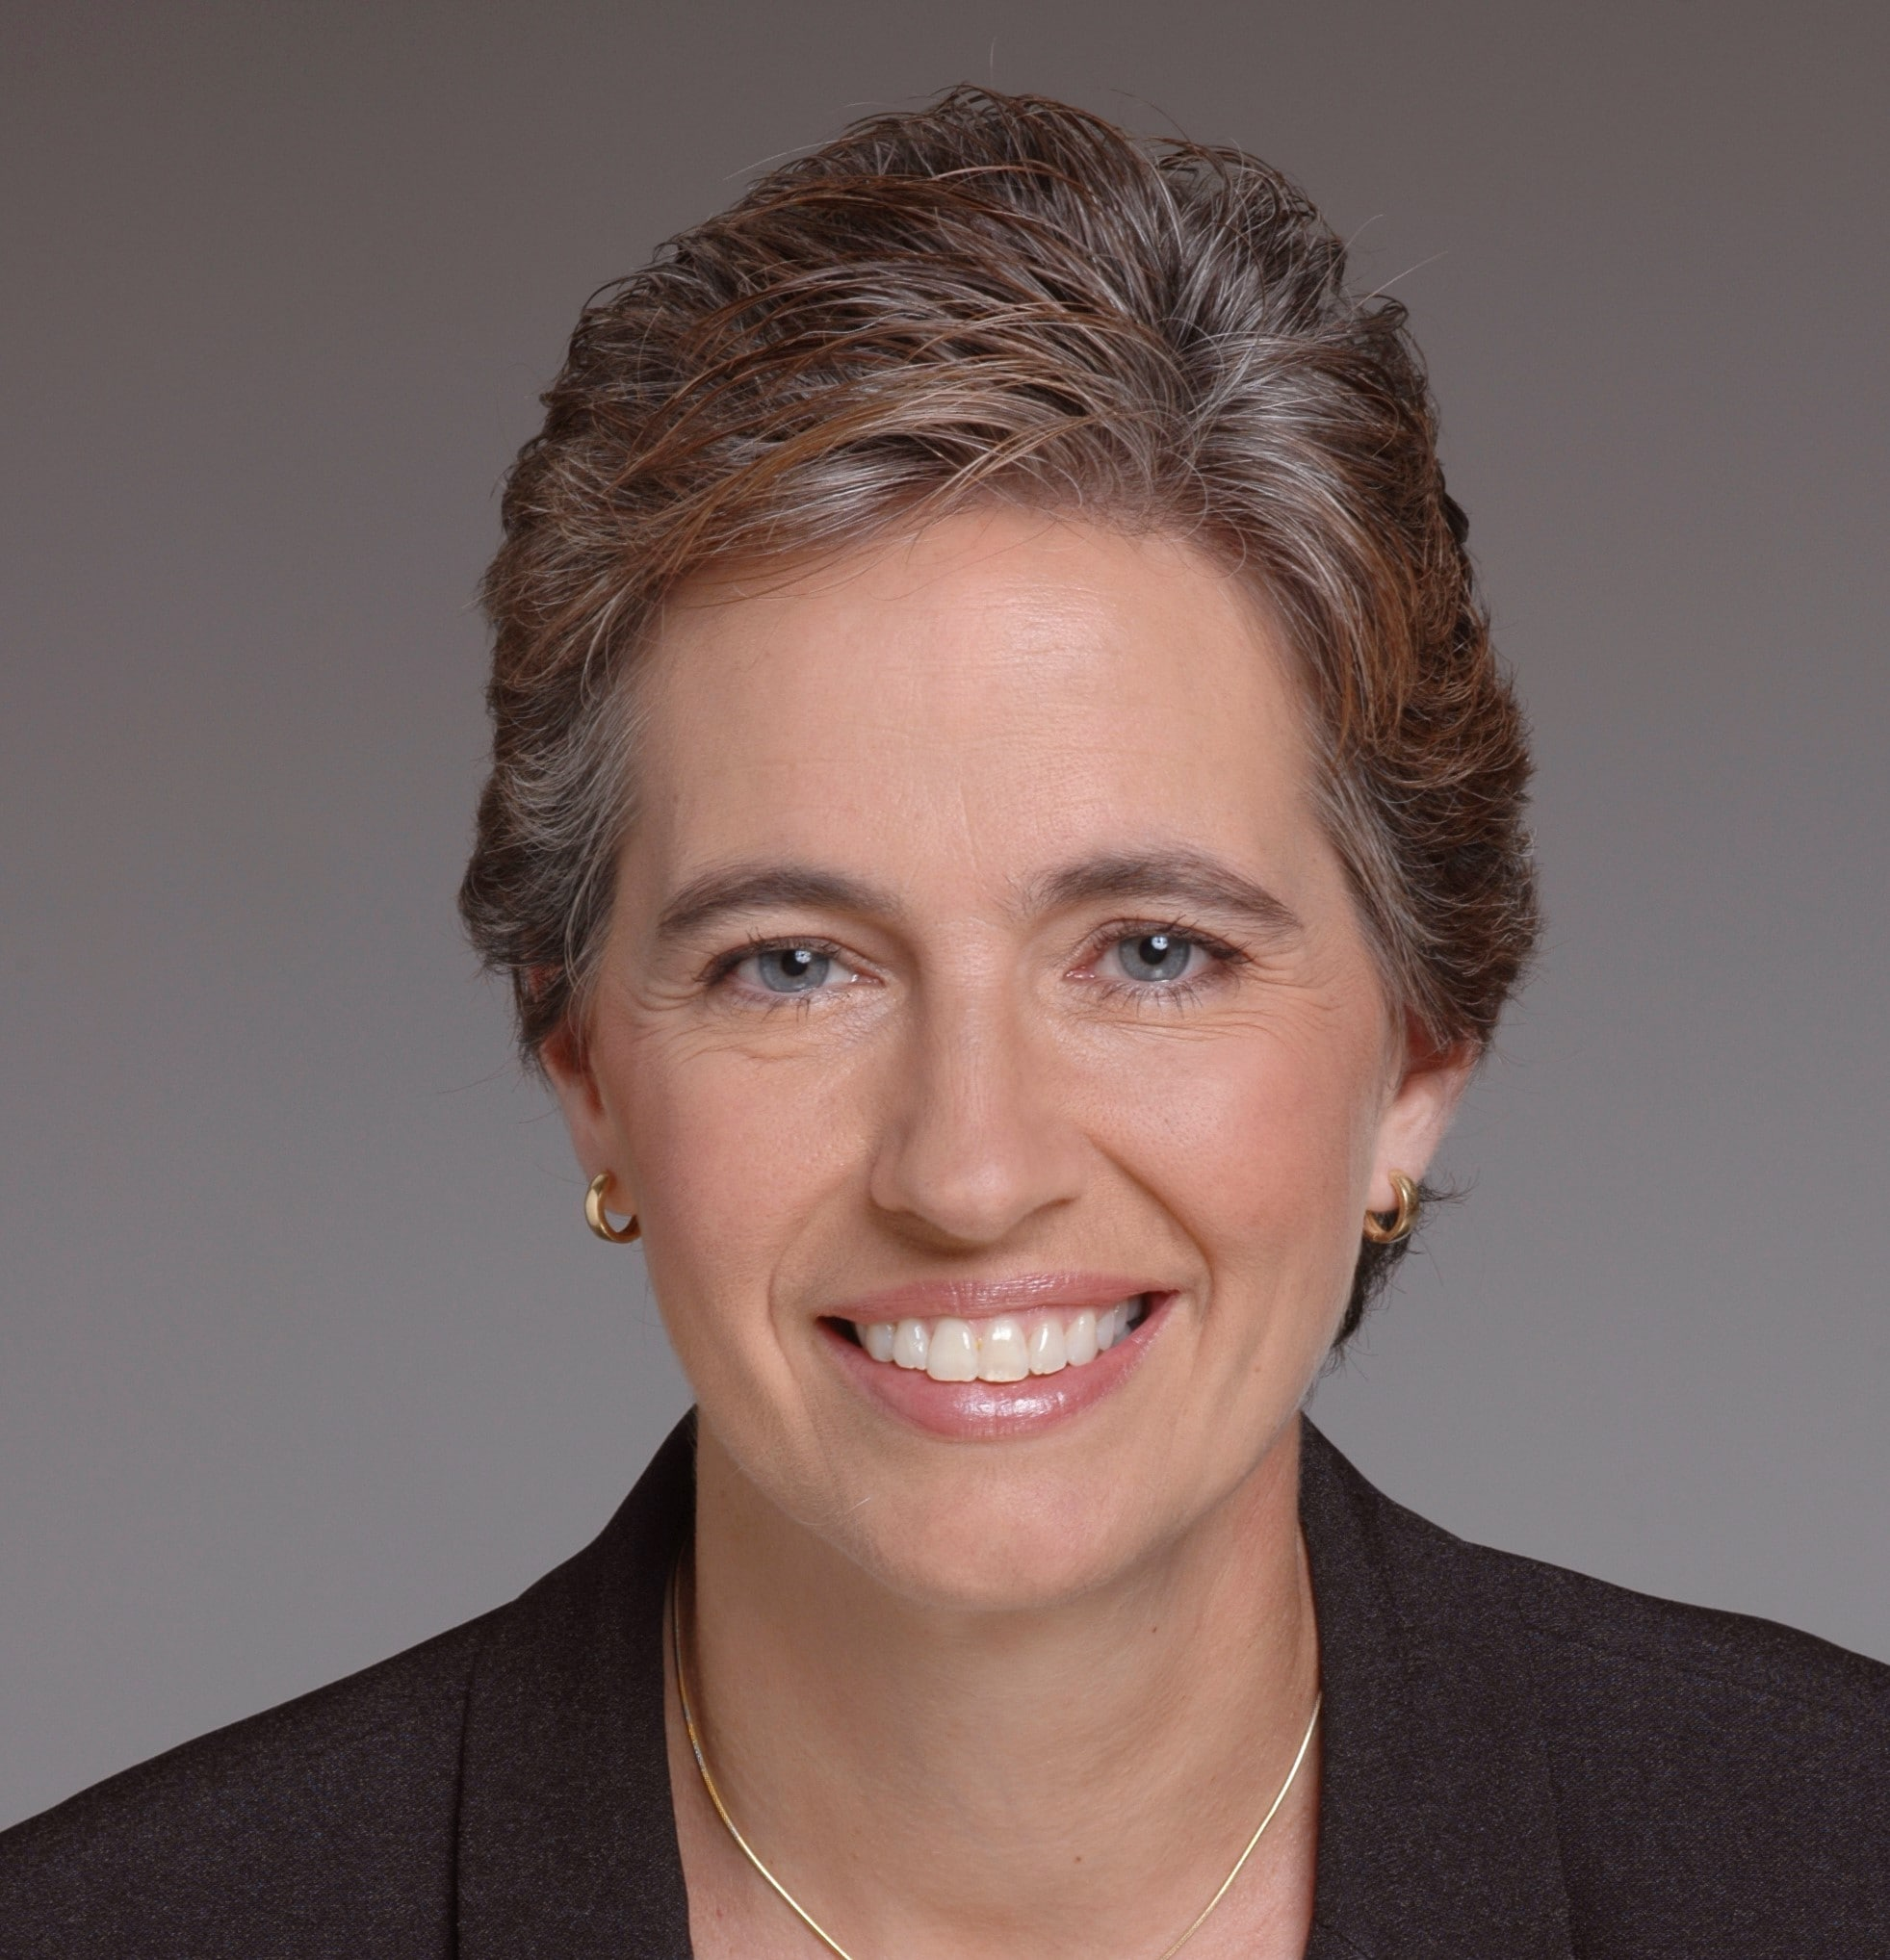 Elizabeth McConnell, MD, FACS, FASCRS